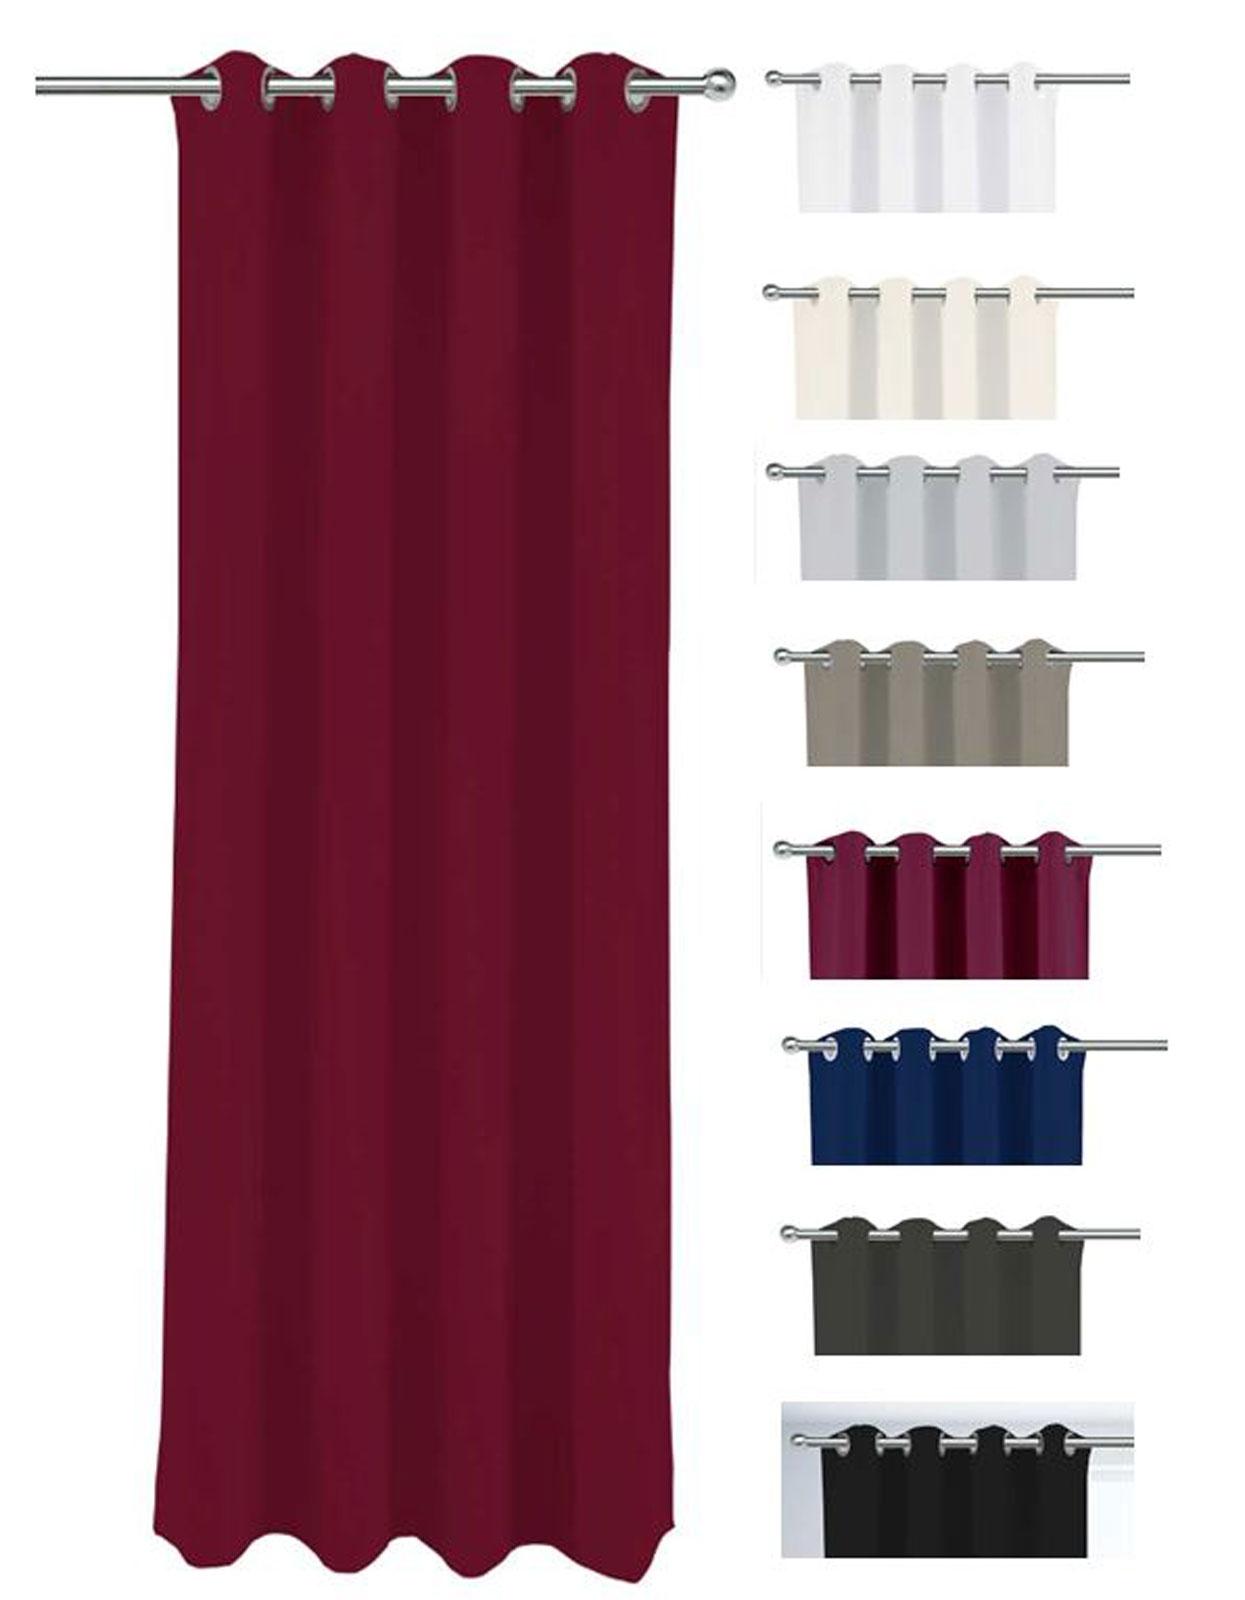 Gardinen und Vorhänge - 2er Pack Goldmond Vorhang Ösenvorhang blickdicht Halbverdunkelung Venedig 140x245cm  - Onlineshop PremiumShop321